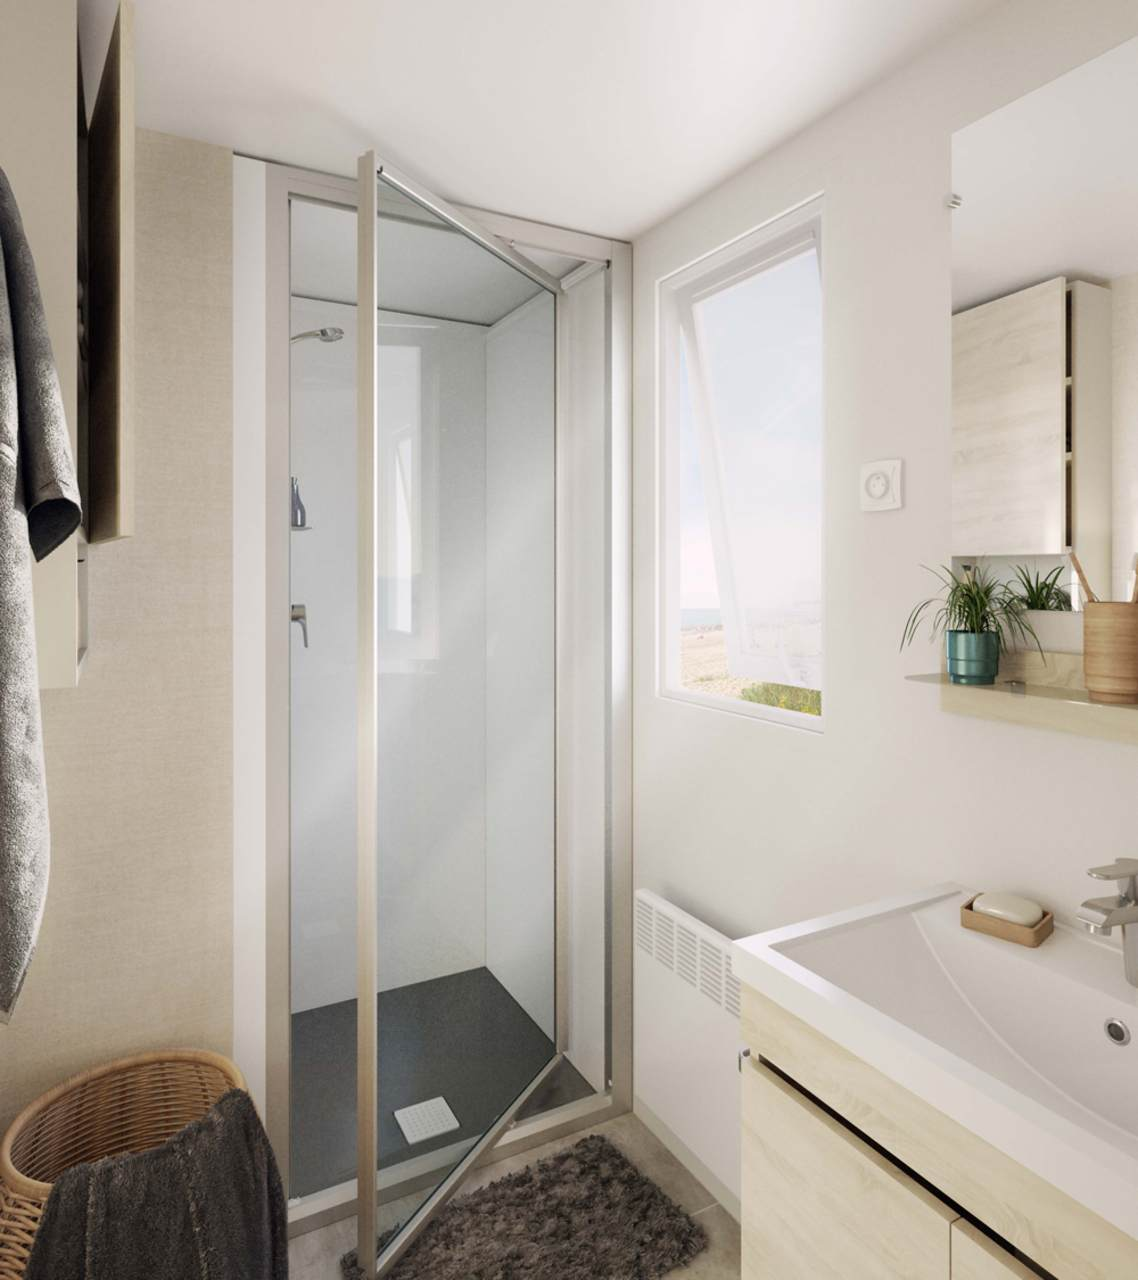 IRM AZALEE 2020 - Salle de bains